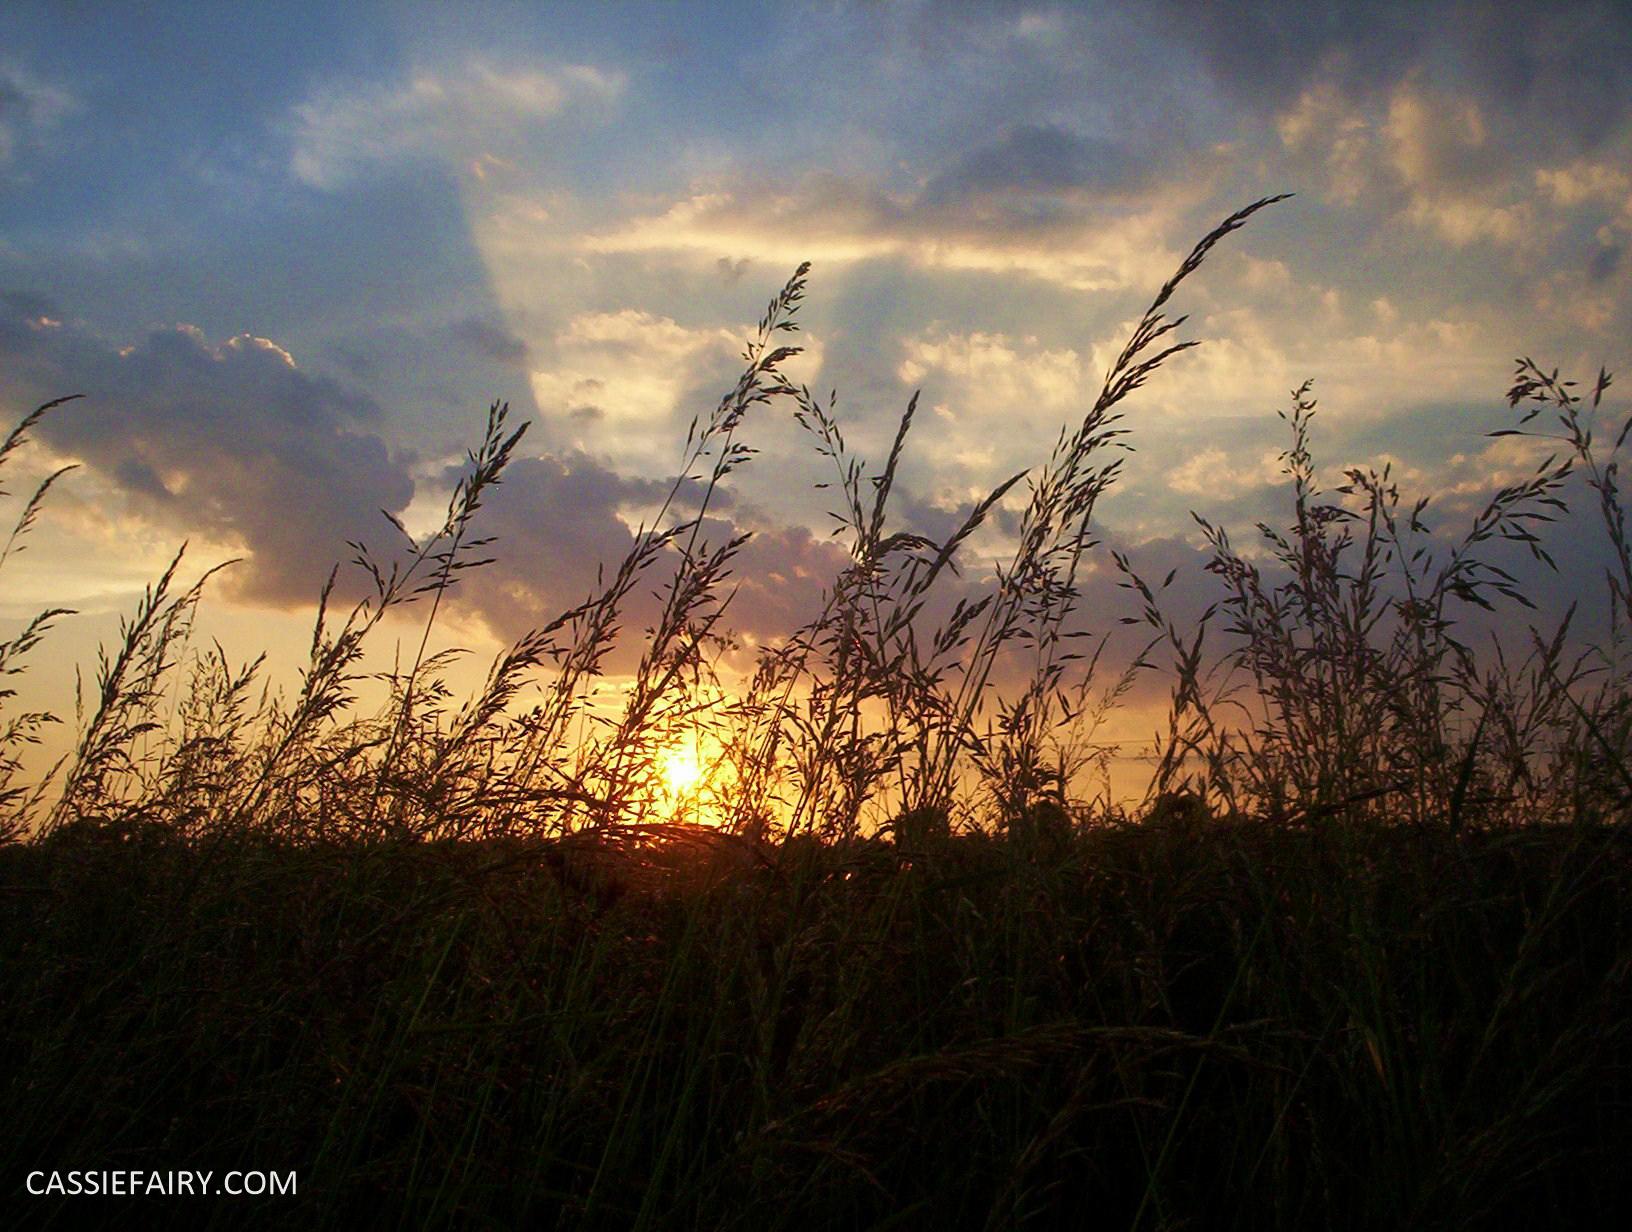 pin golden sunset hd - photo #49